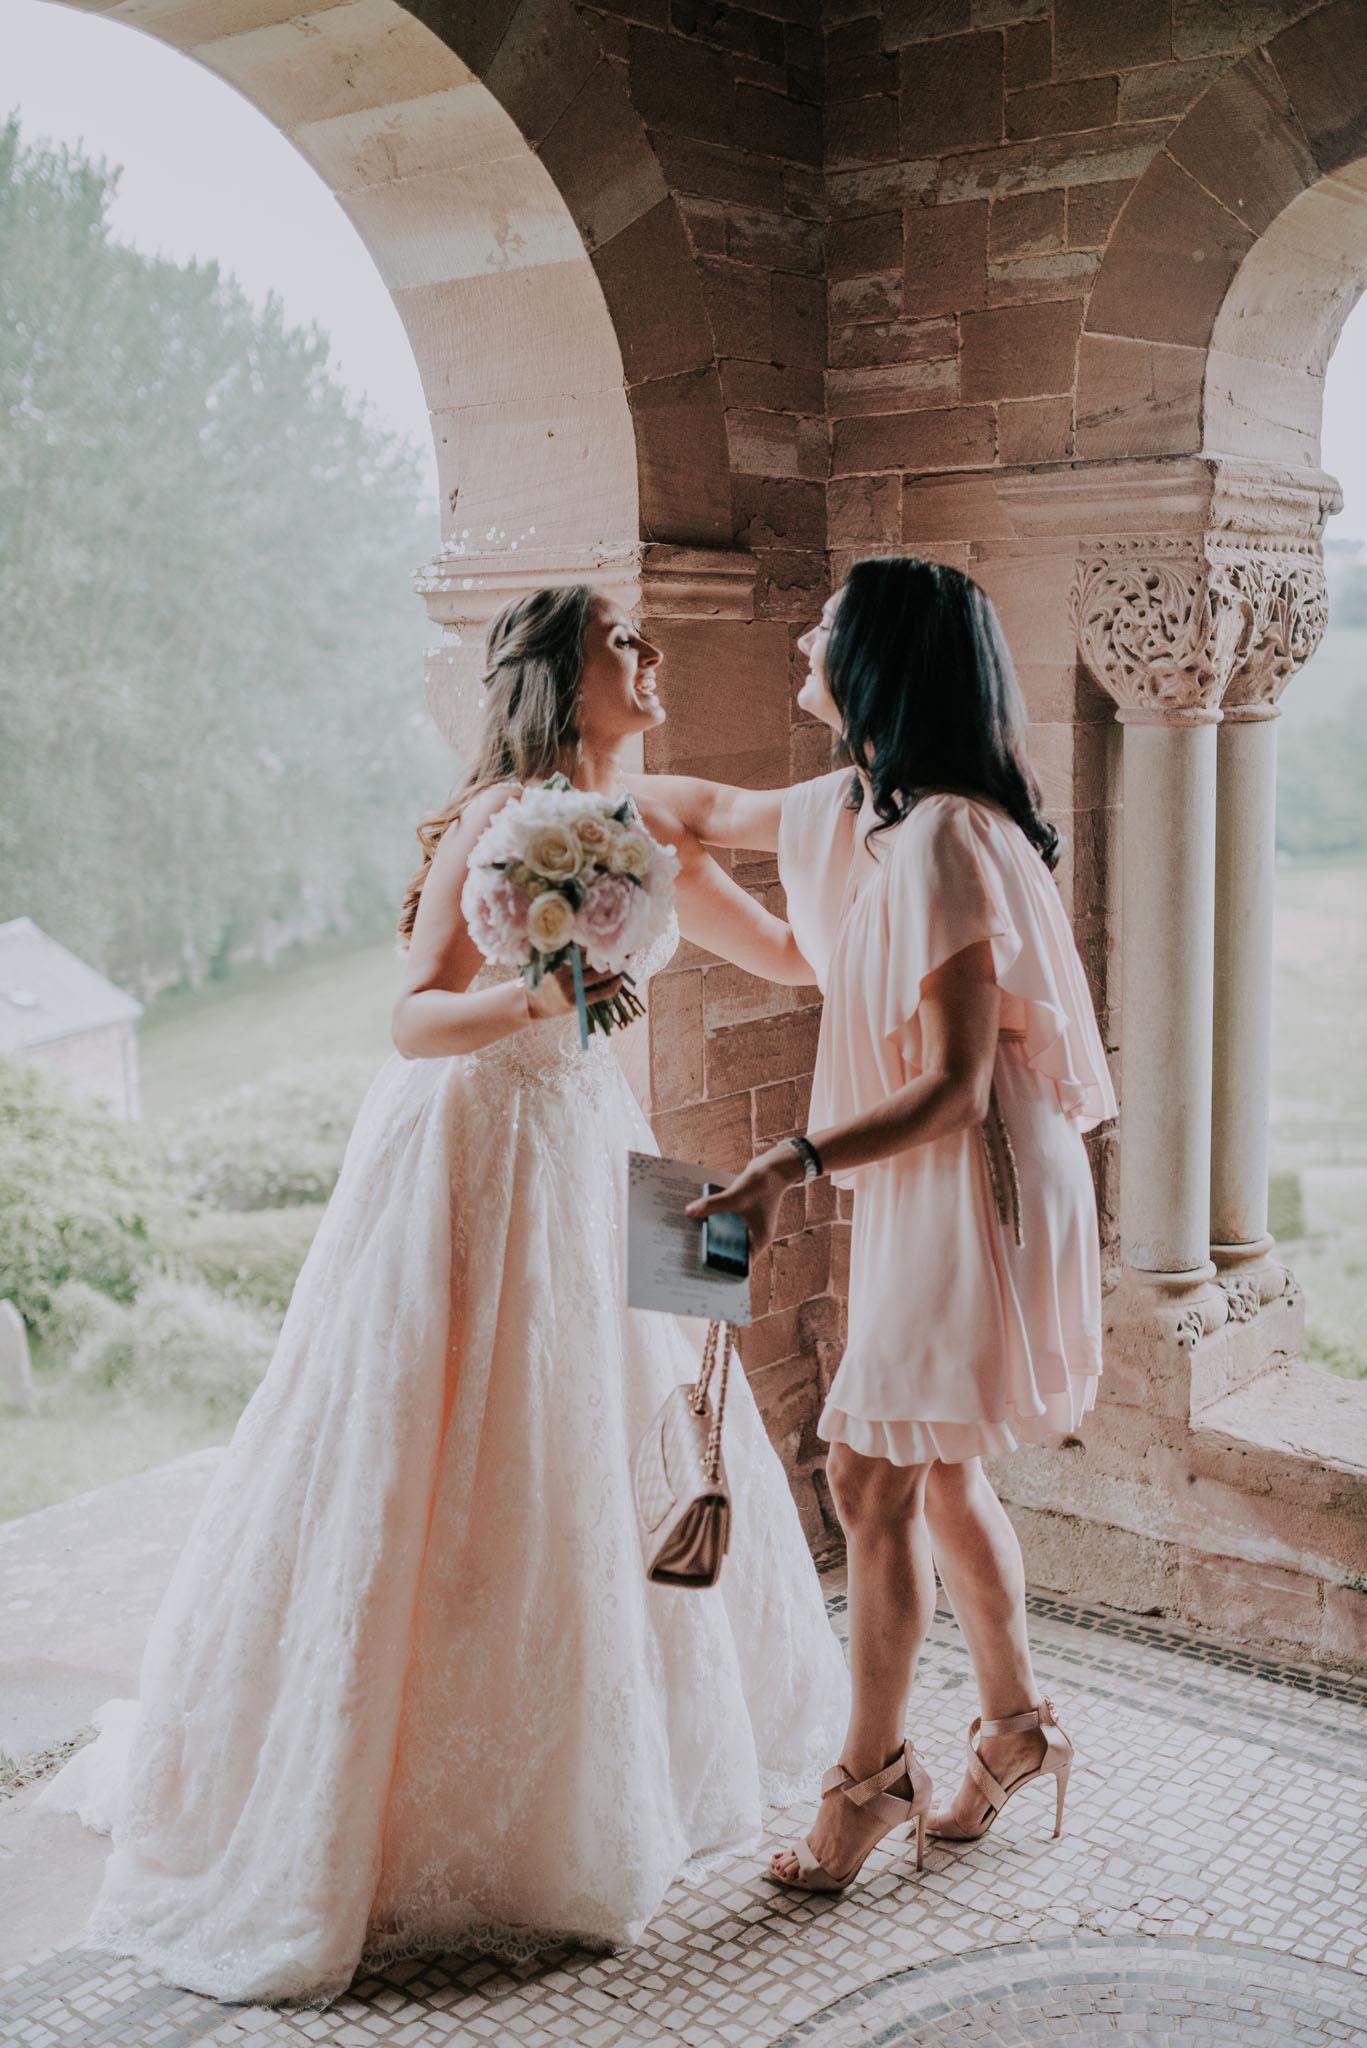 wedding-photographer-glewstone-court-hereford-scott-stockwell-photography233.jpg